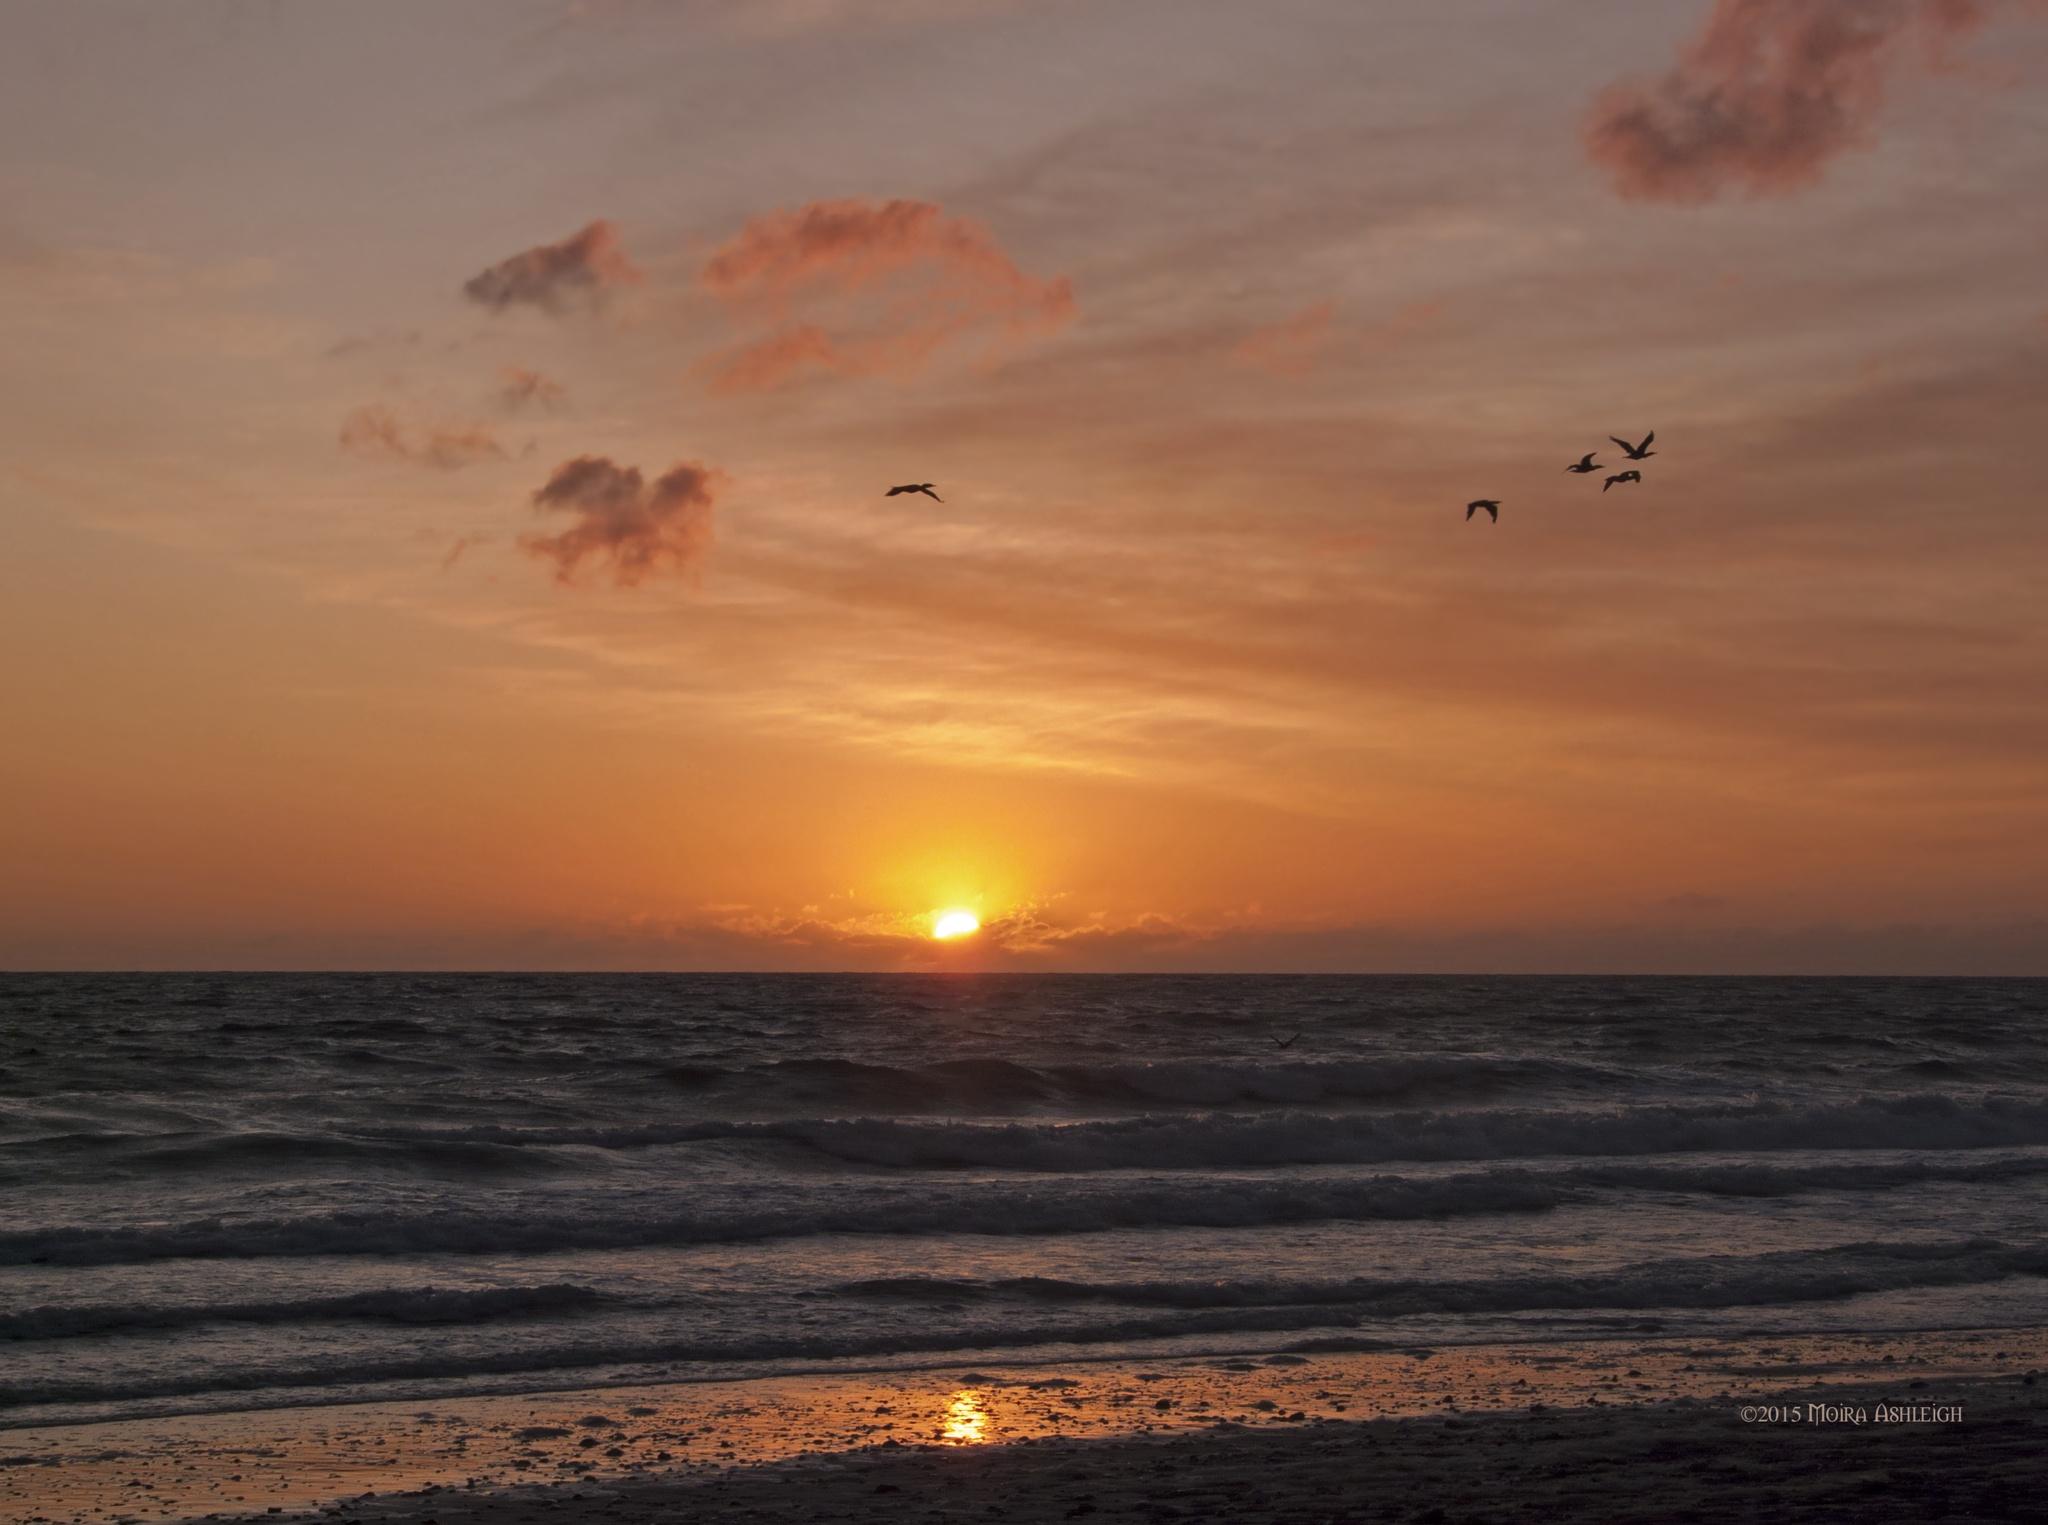 Sunrise for Five Cormorants by Moira Ashleigh